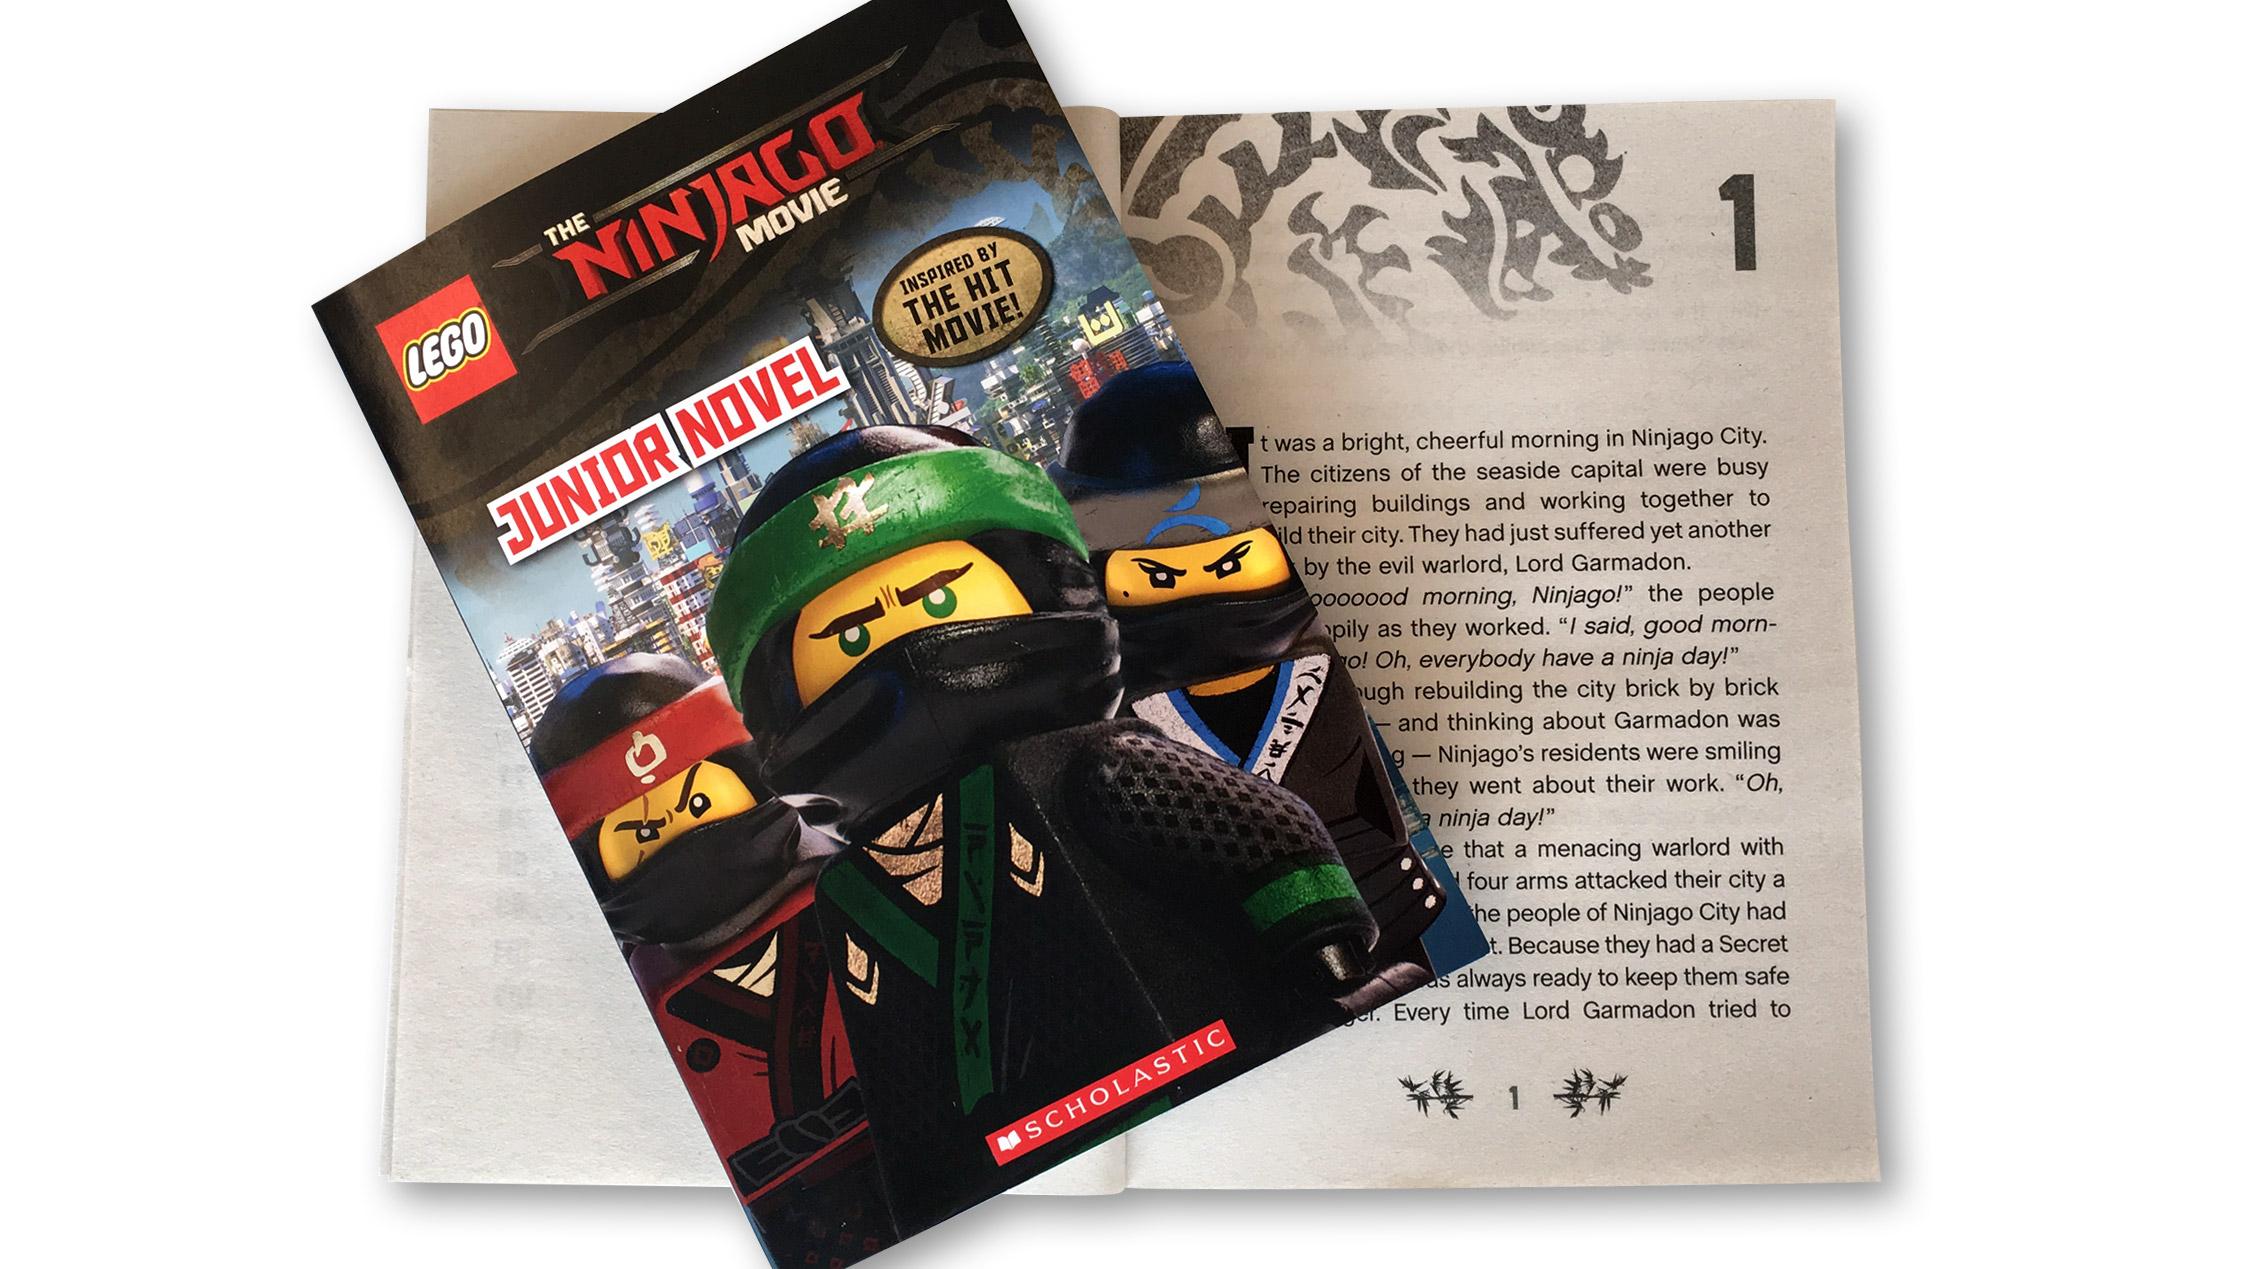 First Look at the LEGO Ninjago Movie Novel! - LEGO Ninjago ...